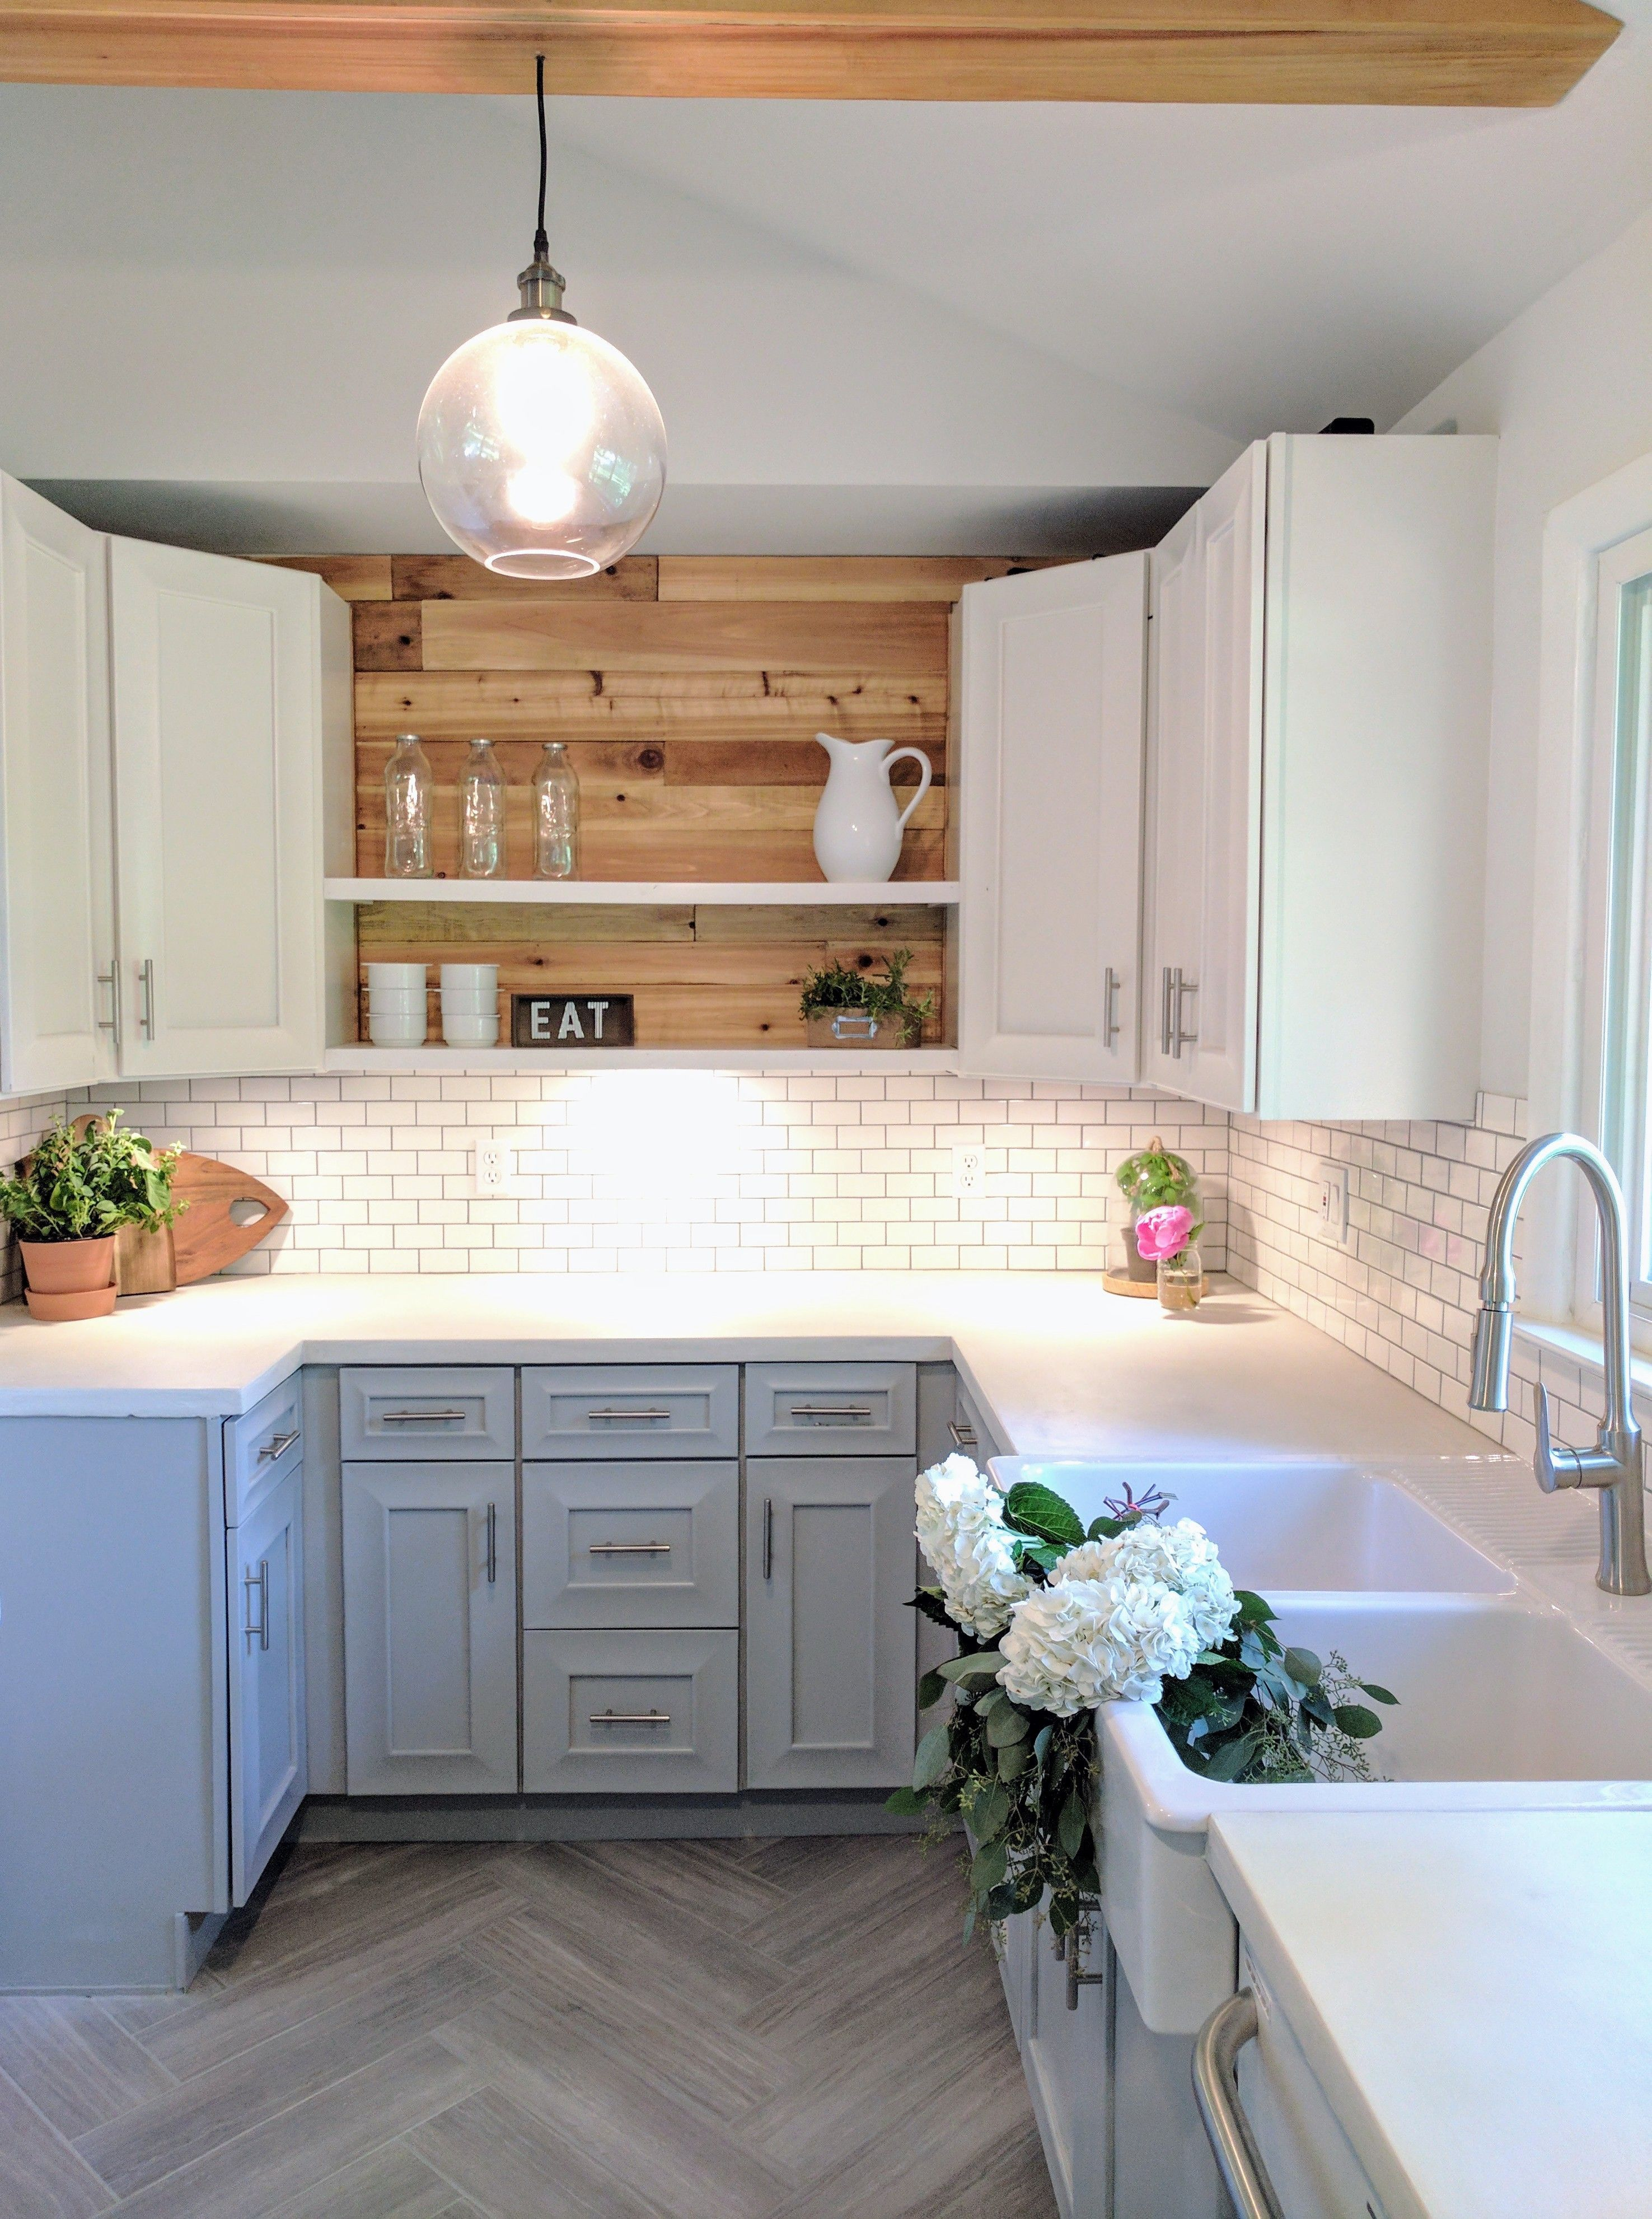 Best 20 Small Kitchen Renovations Ideas Kitchen Design Small Kitchen Remodel Small Kitchen Layout